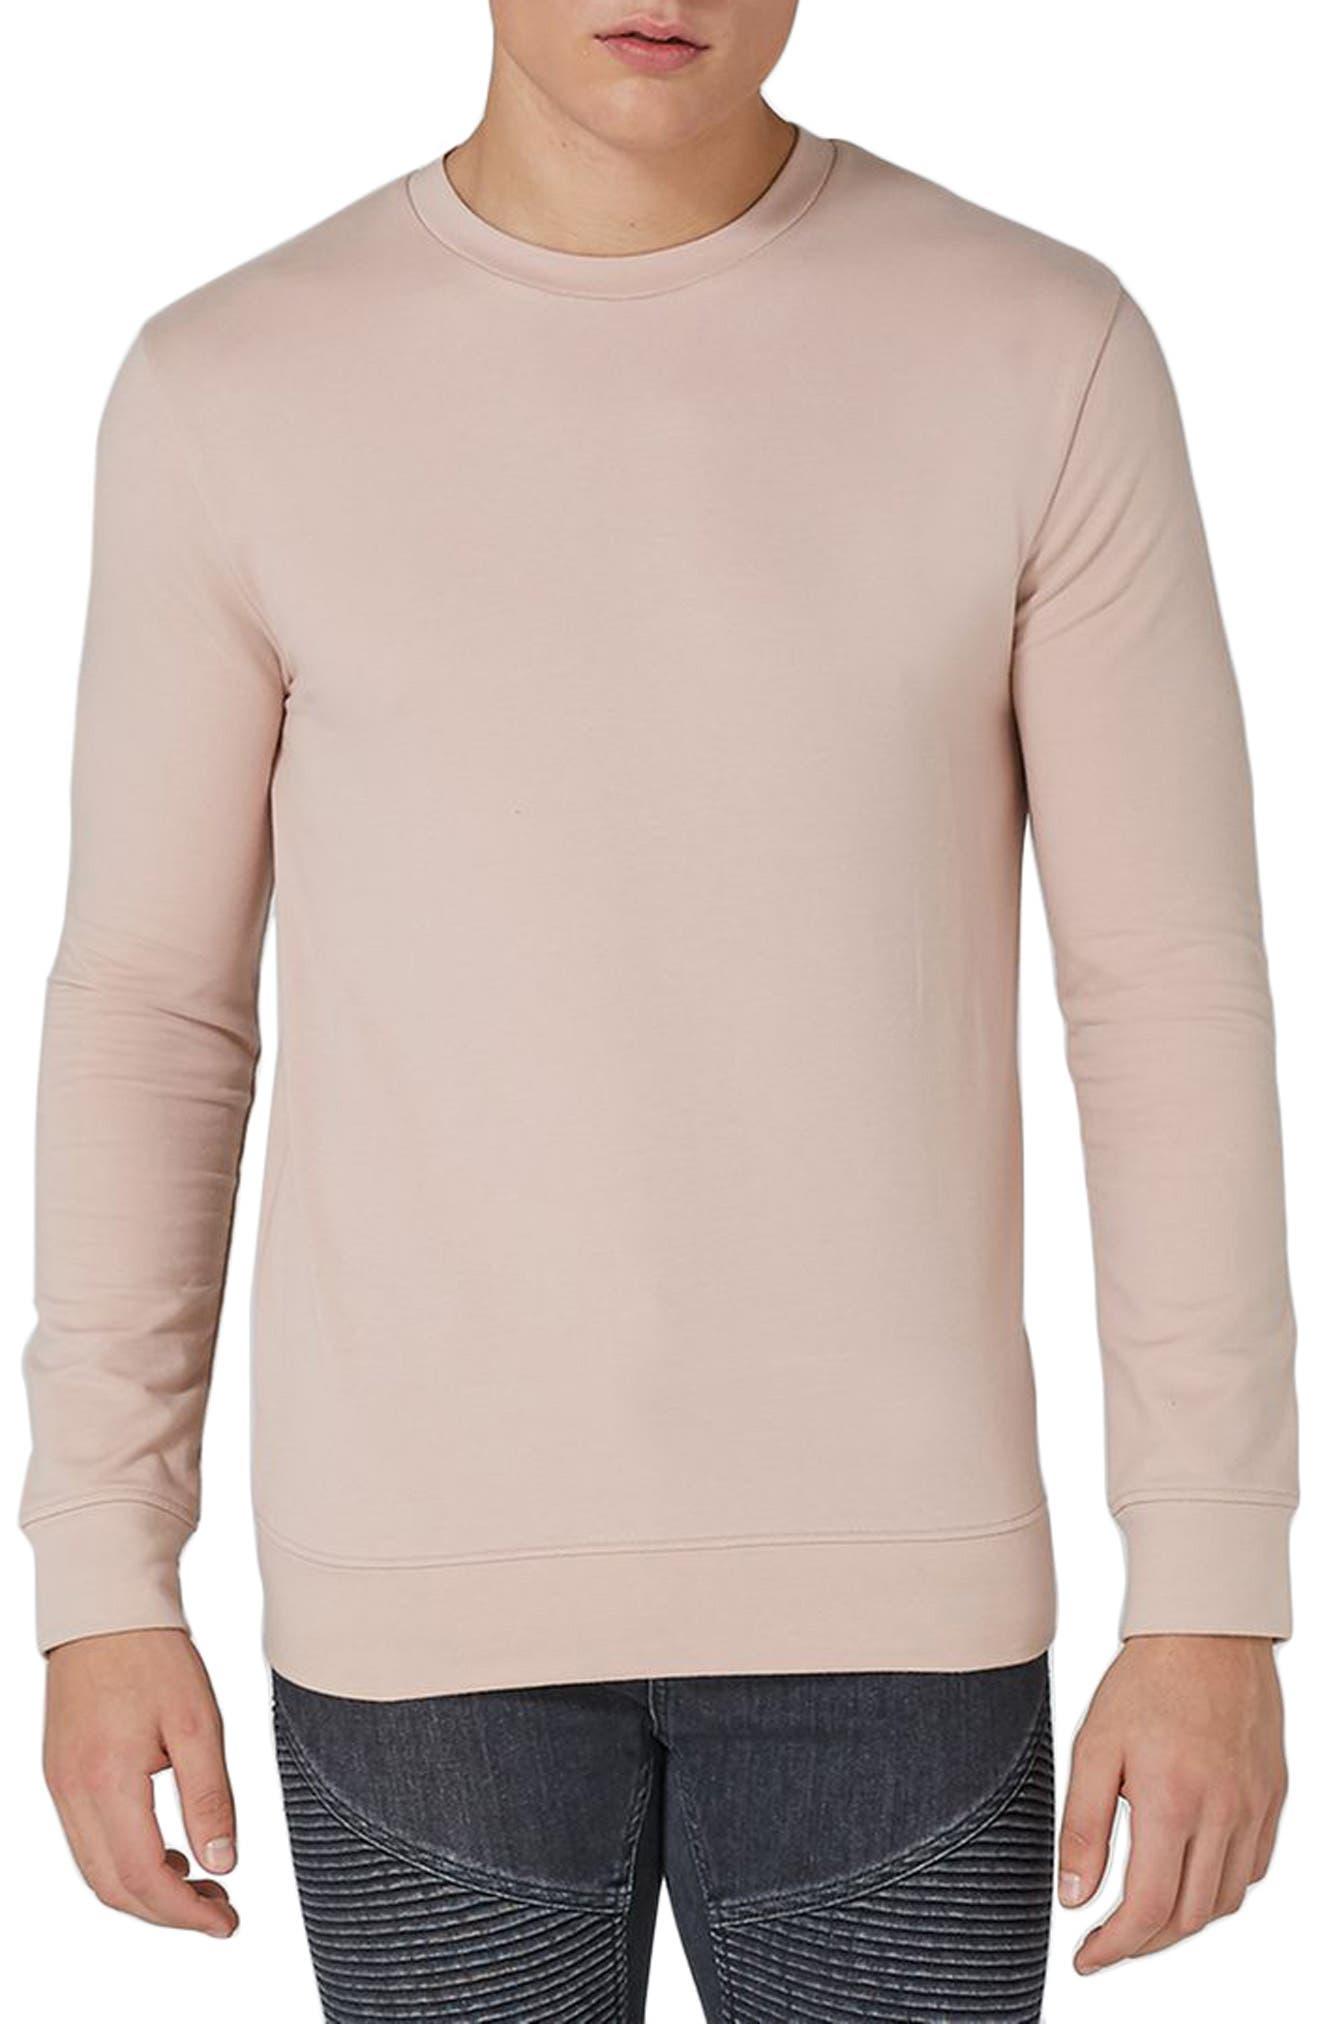 Ultra Muscle Fit Sweatshirt,                             Main thumbnail 2, color,